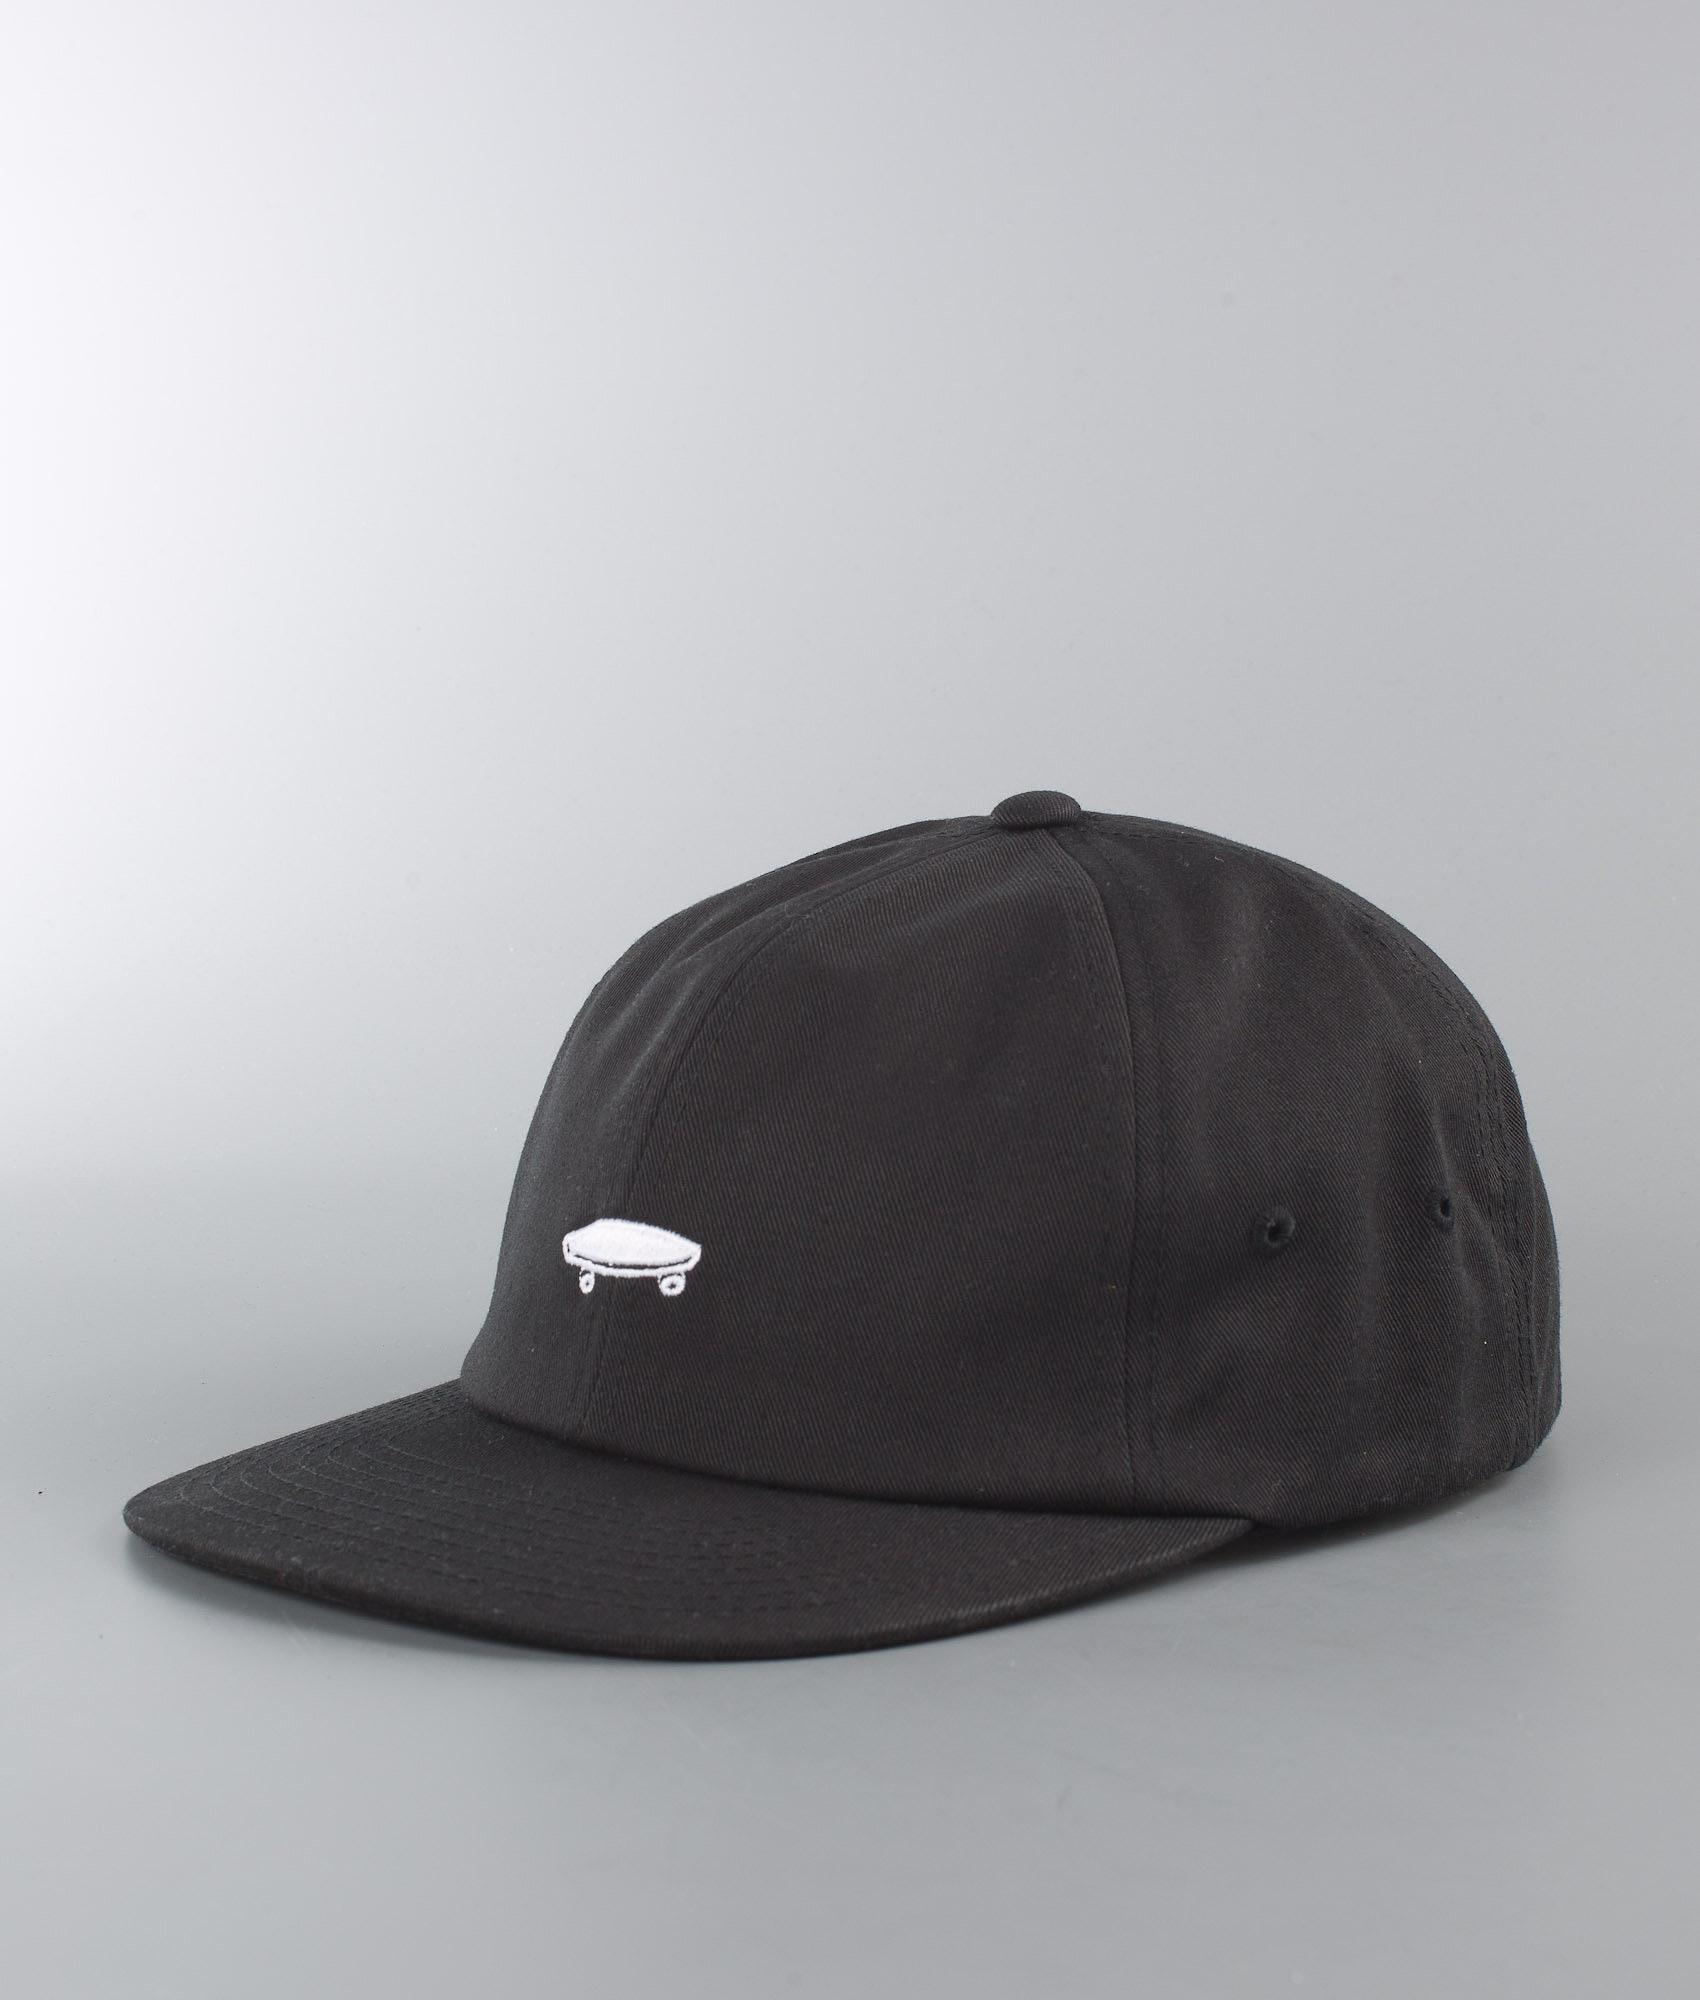 Vans Thrasher X Vans Jockey Cap Black (Thrasher) - Ridestore.com 97366e9d4cf